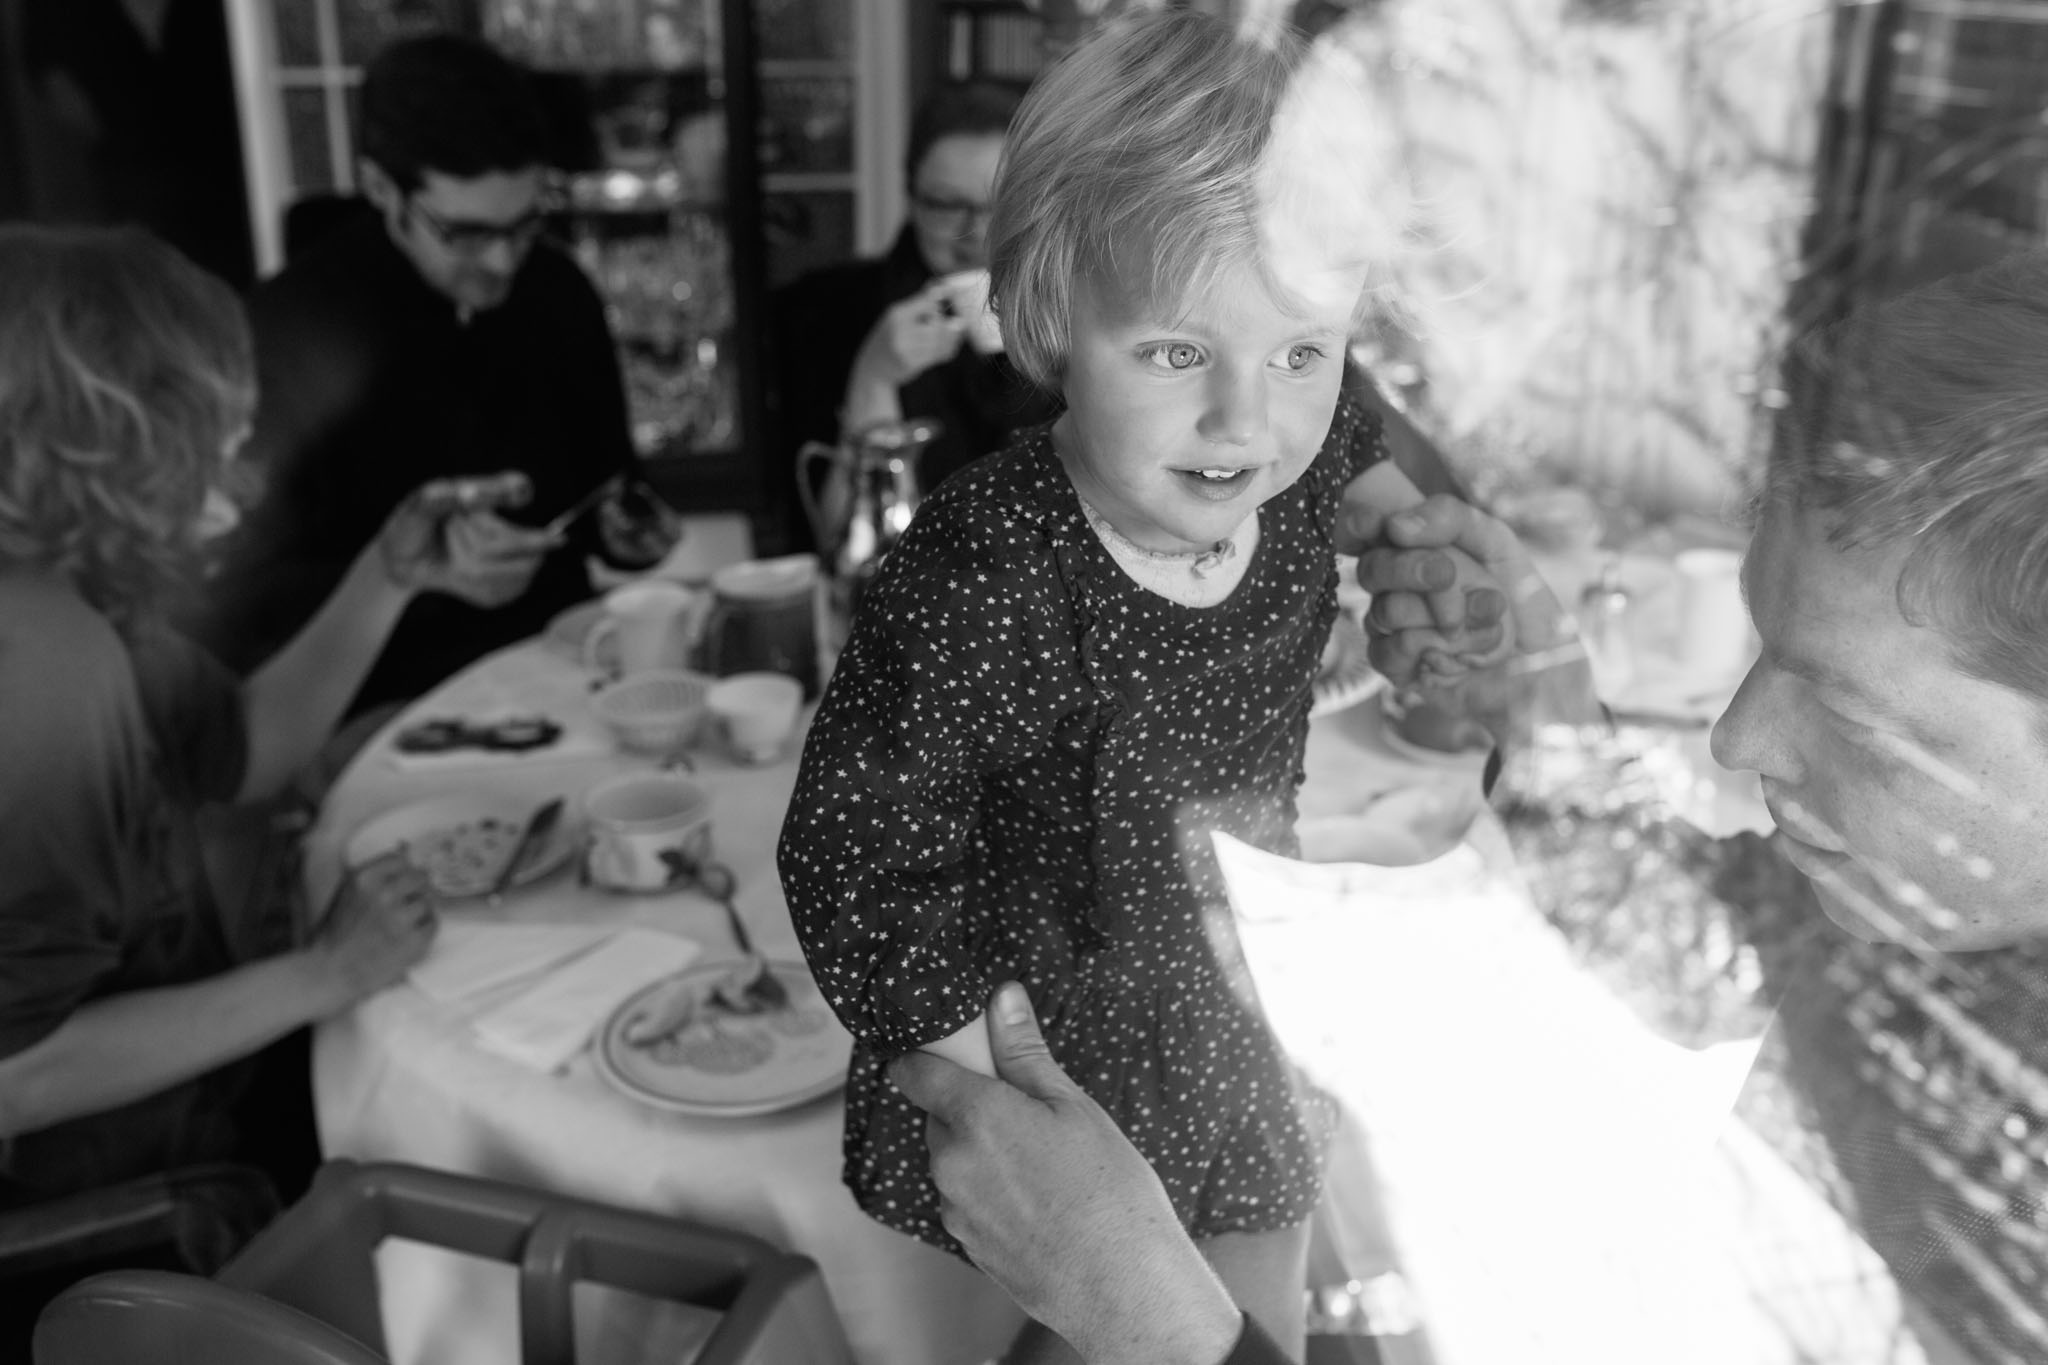 familienfotos-reportage-berlin